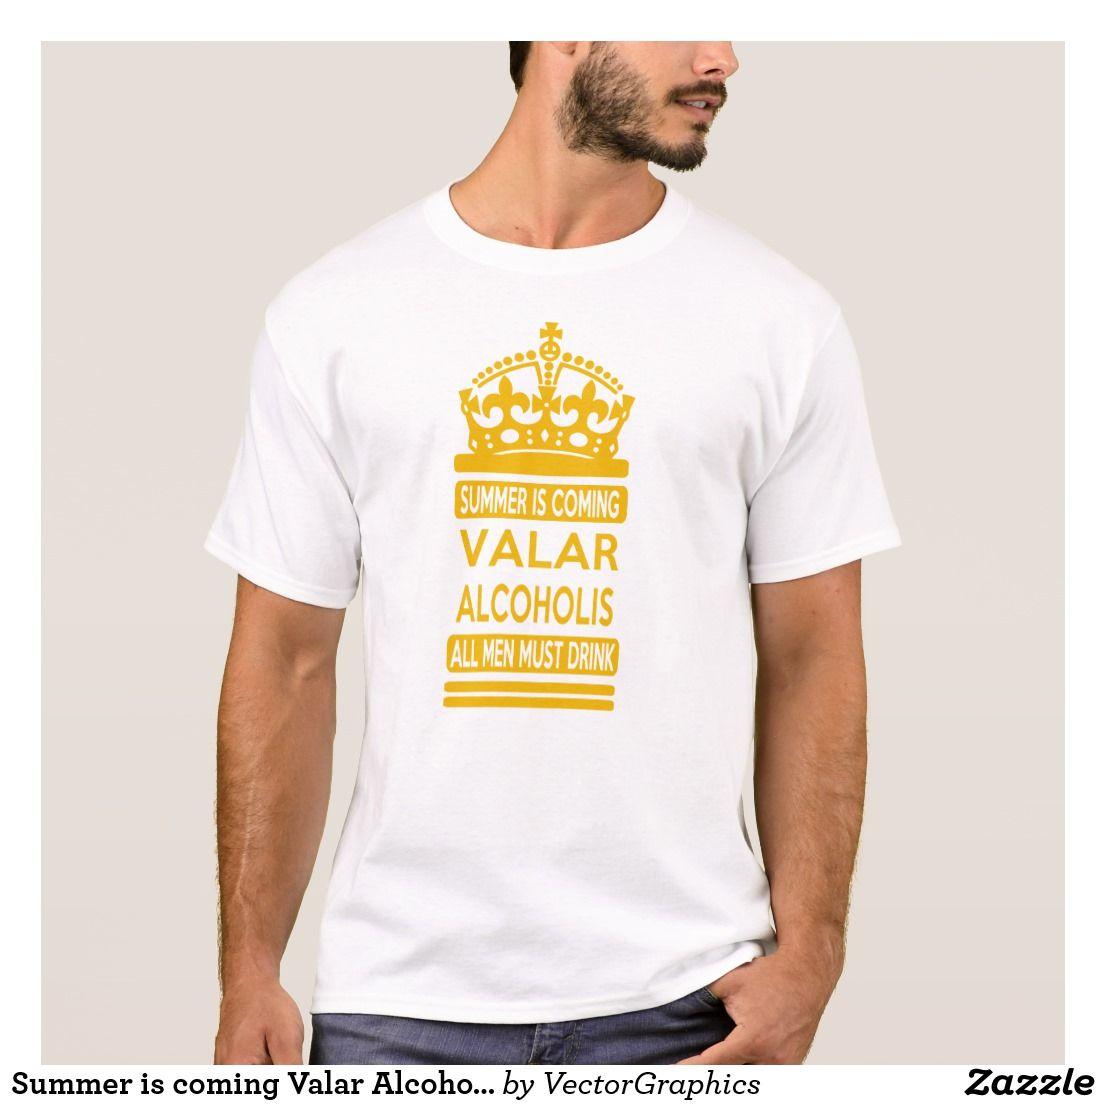 Zazzle t shirt design template - Summer Is Coming Valar Alcoholis T Shirt